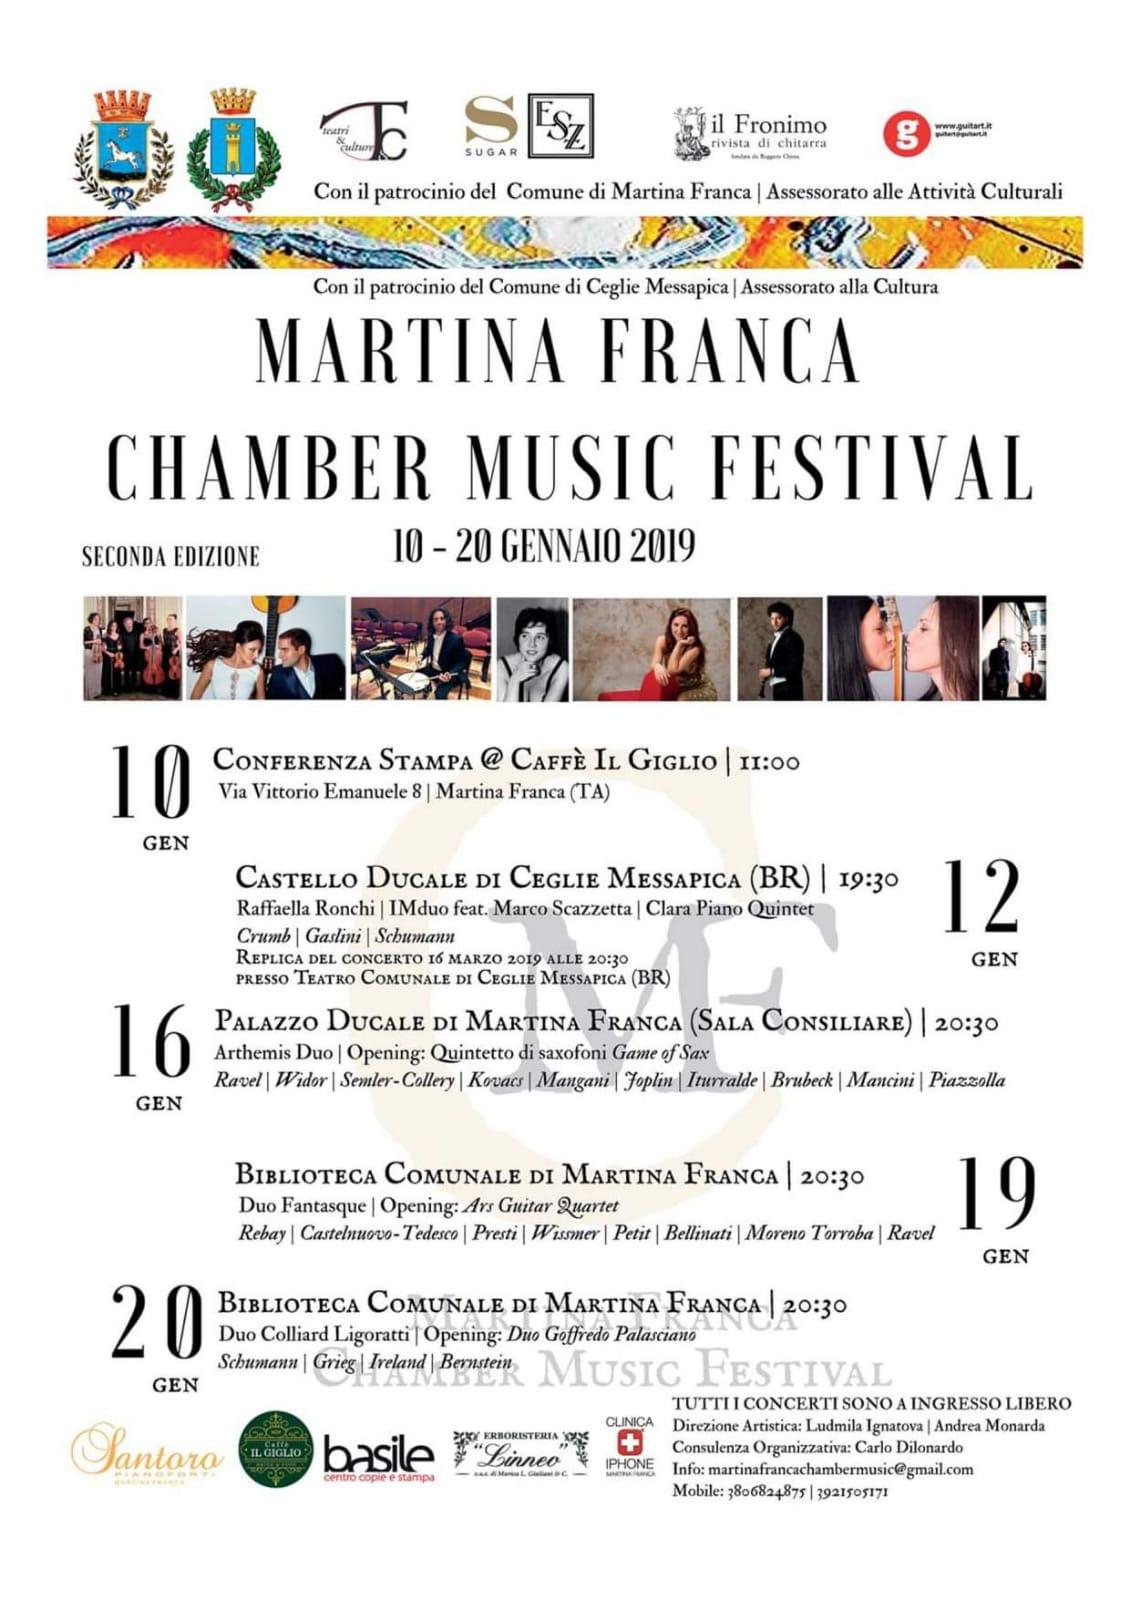 Martina Franca Chamber Music Festival